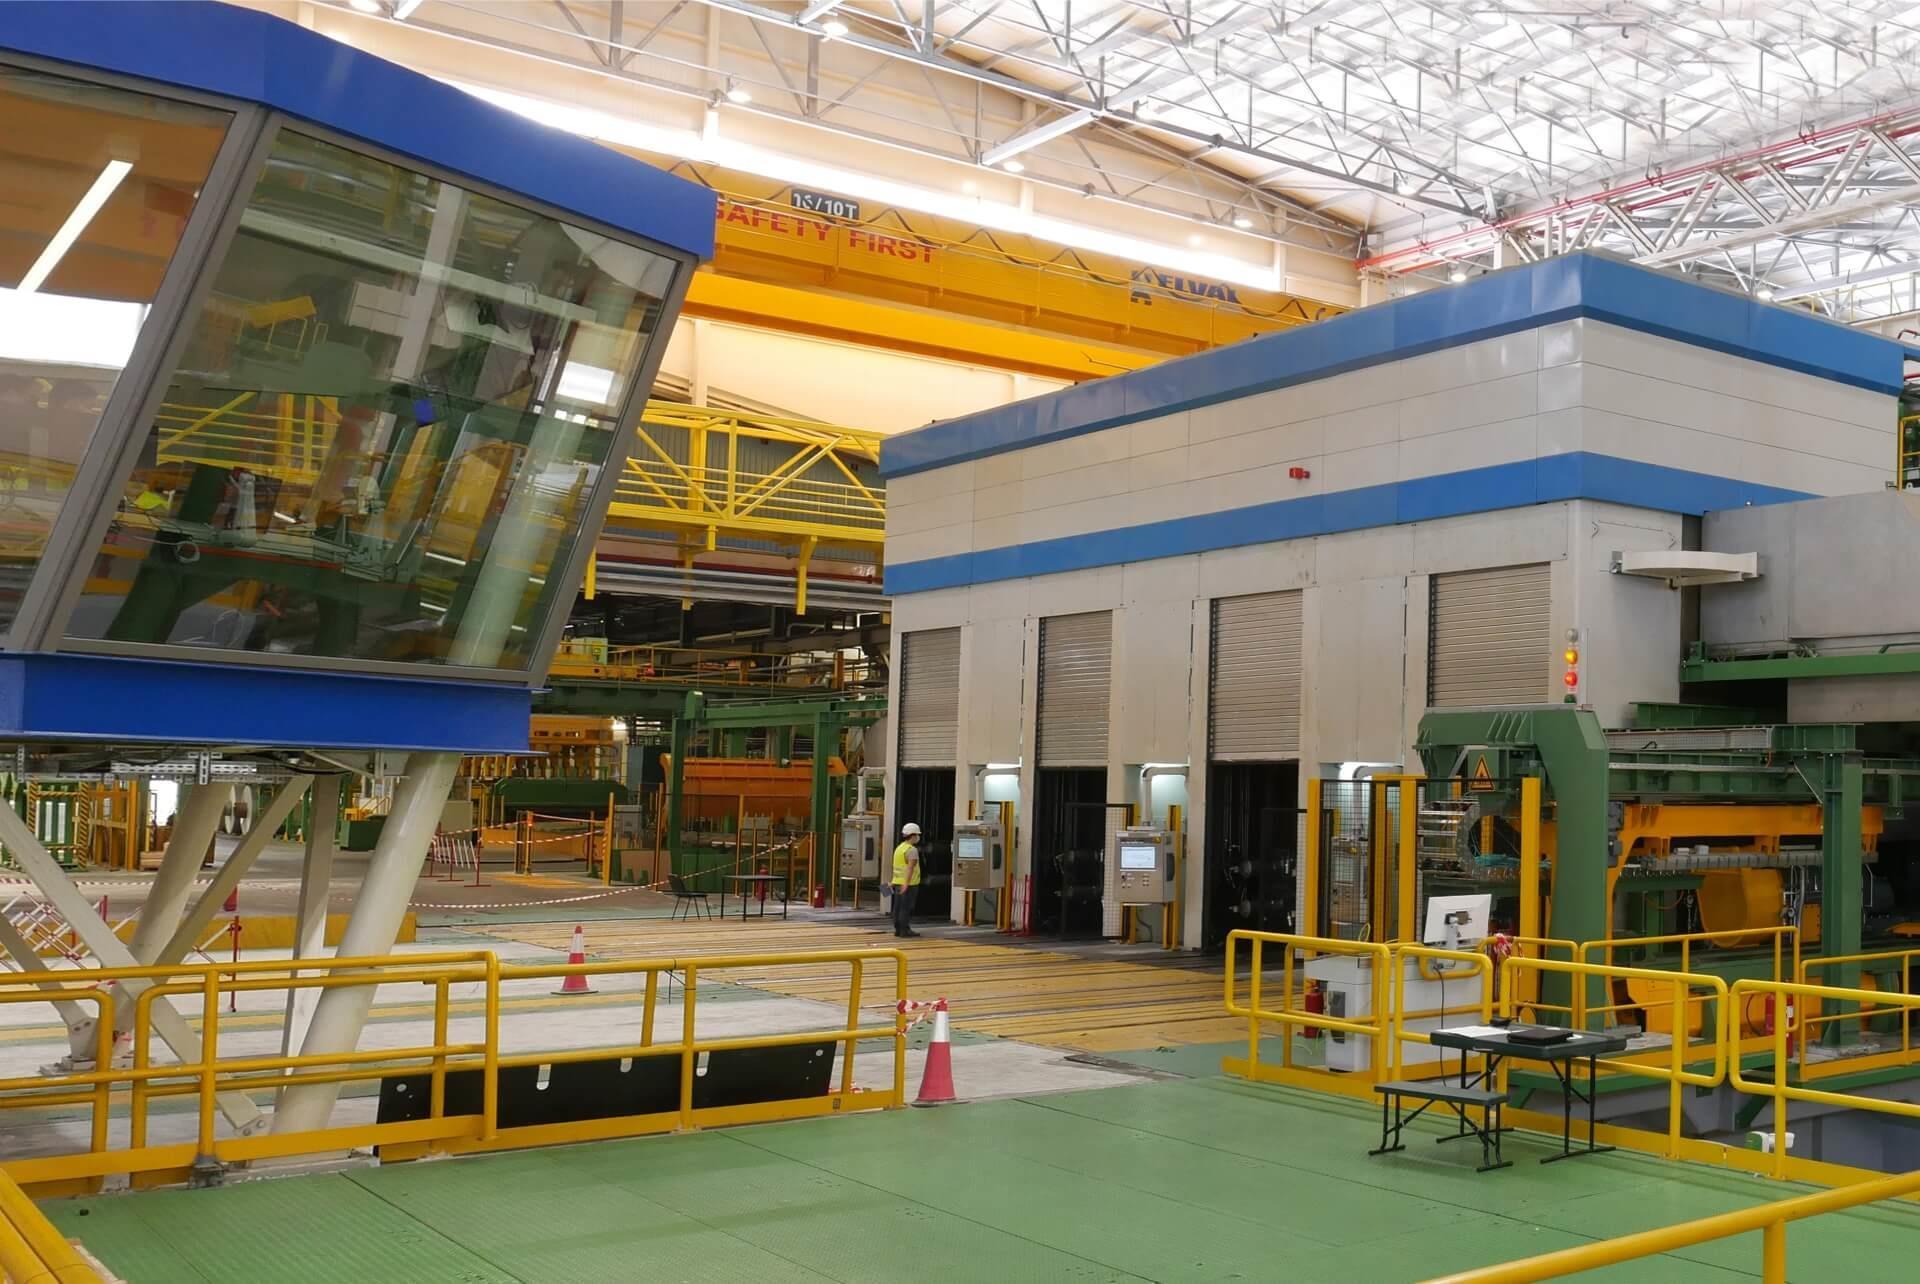 H Elval, κορυφαία βιομηχανία έλασης αλουμινίου, διαθέτει το πιο σύγχρονο τετραπλό θερμό έλαστρο αλουμινίου